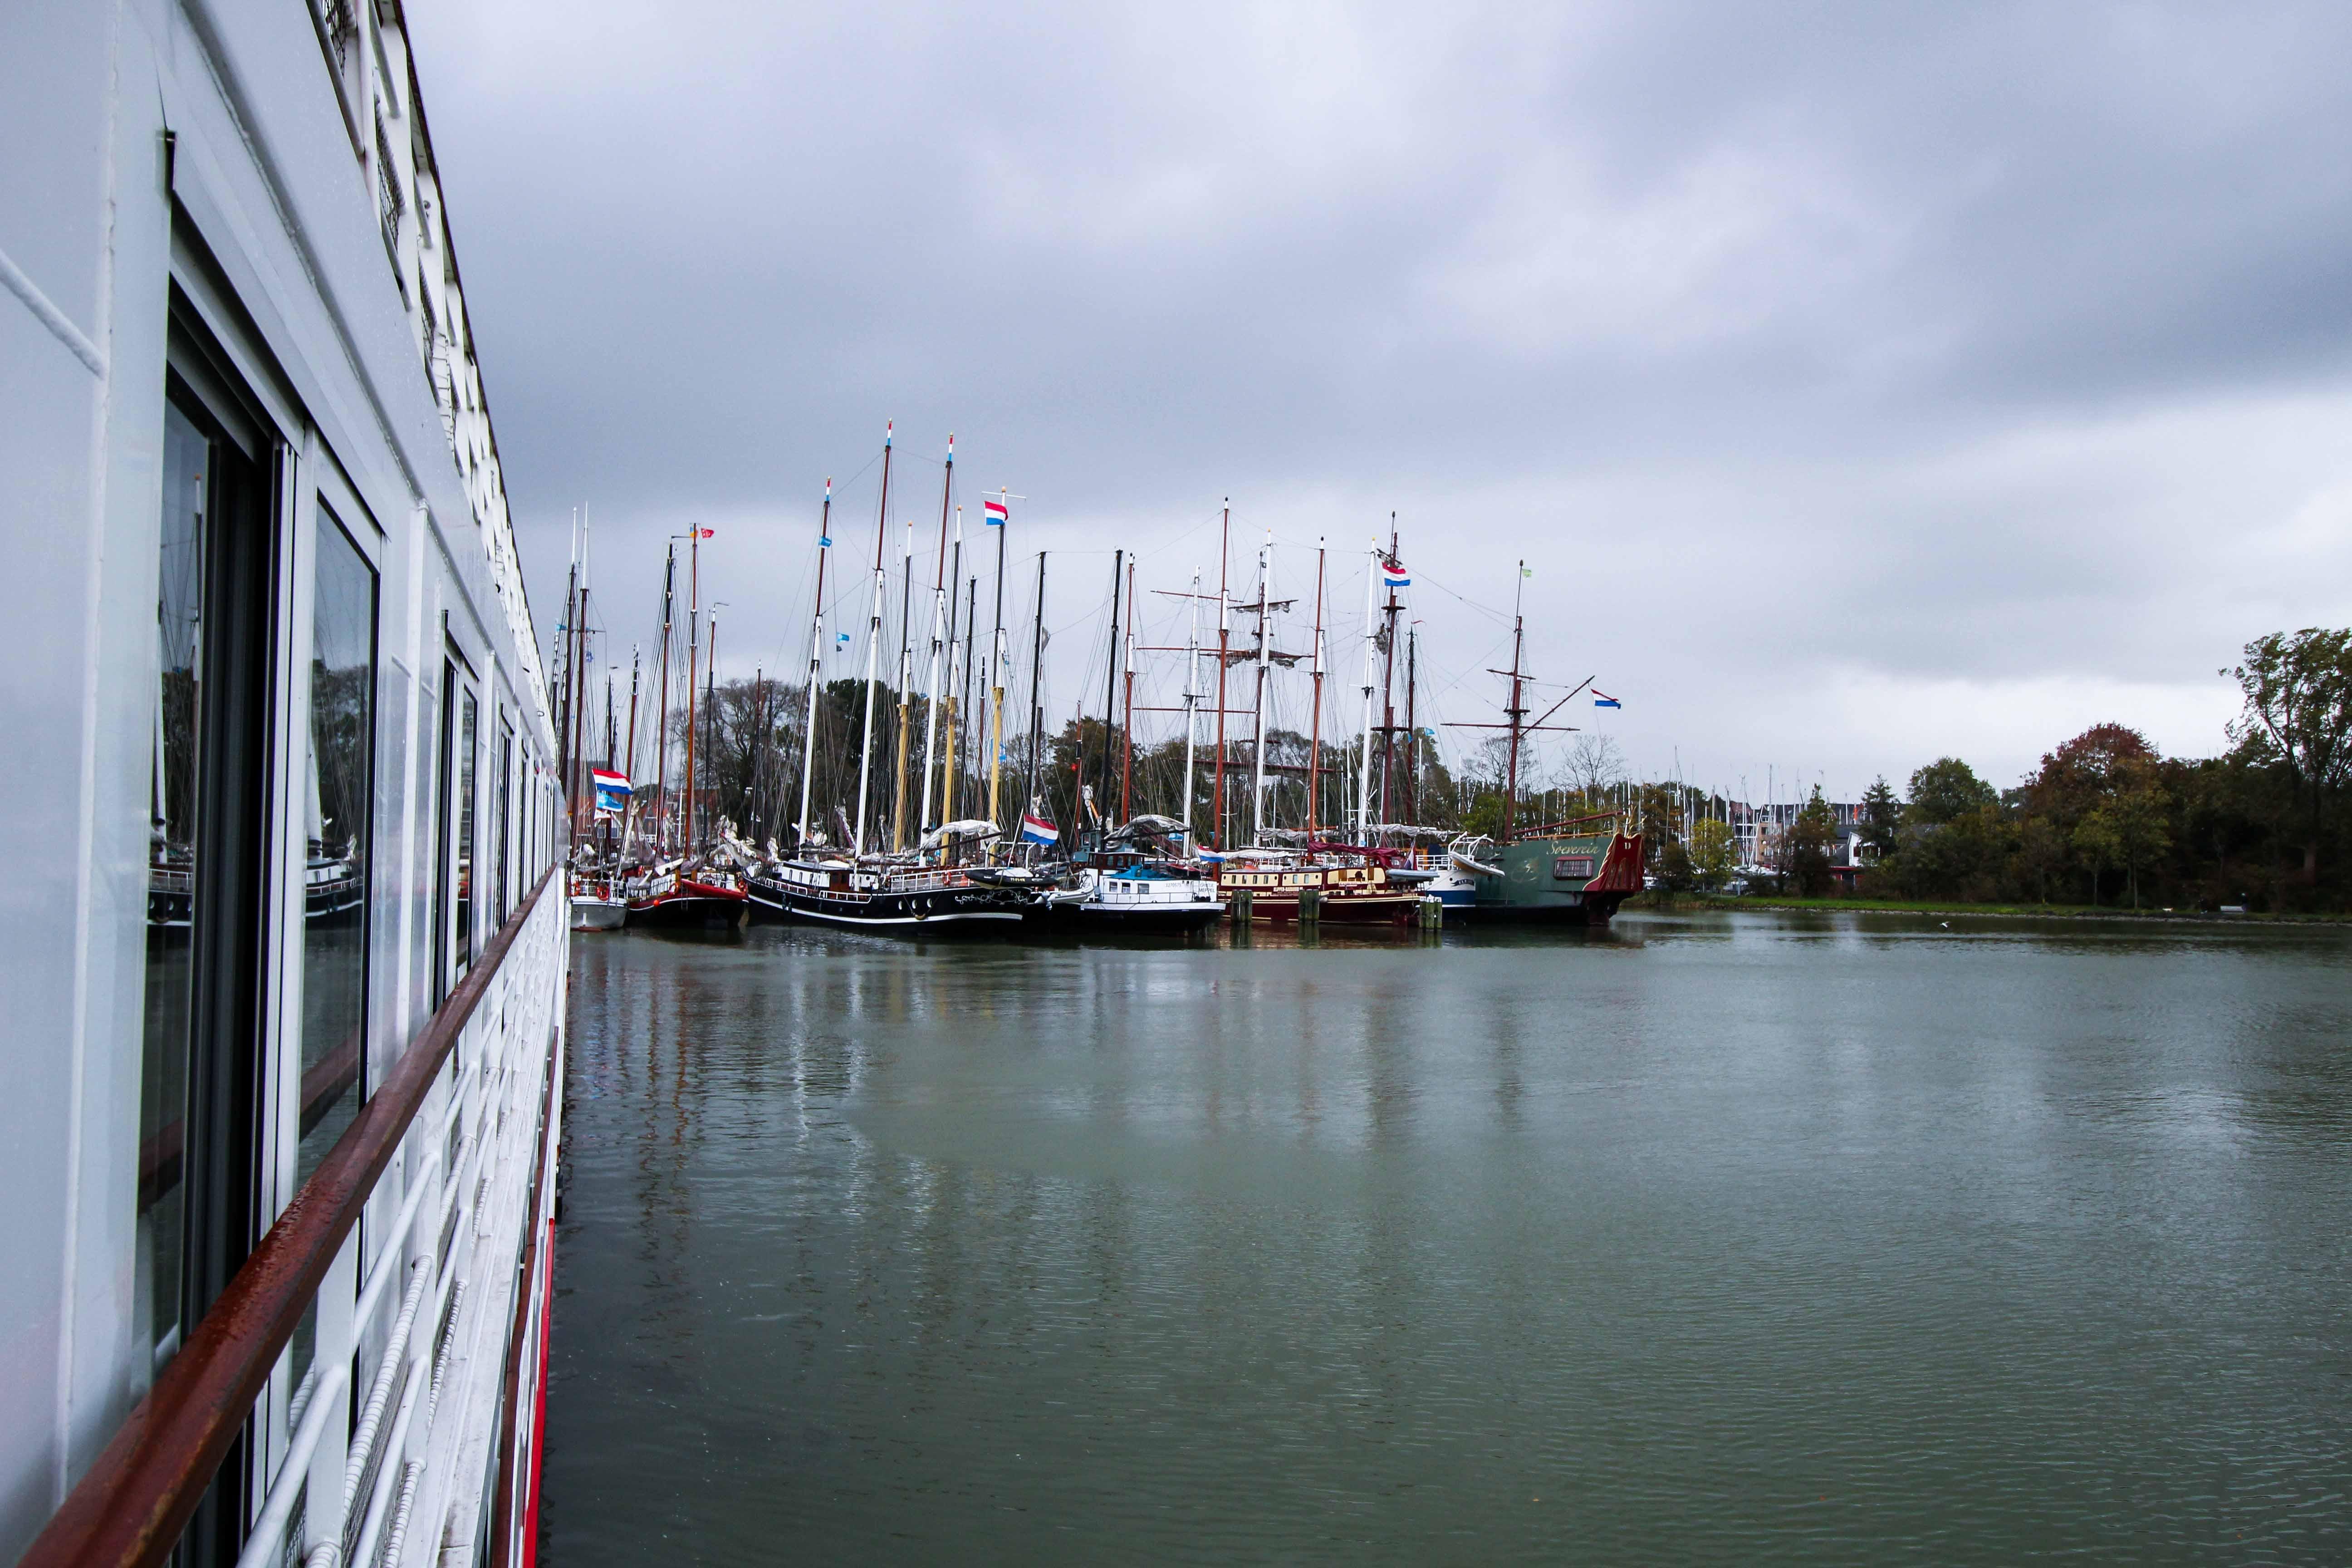 Hoorn Flusskreuzfahrt A-ROSA SILVA Kreuzfahrtschiff Rhein Erlebnis Kurs Amsterdam Erfahrung Flusskreuzfahrt Reiseblog